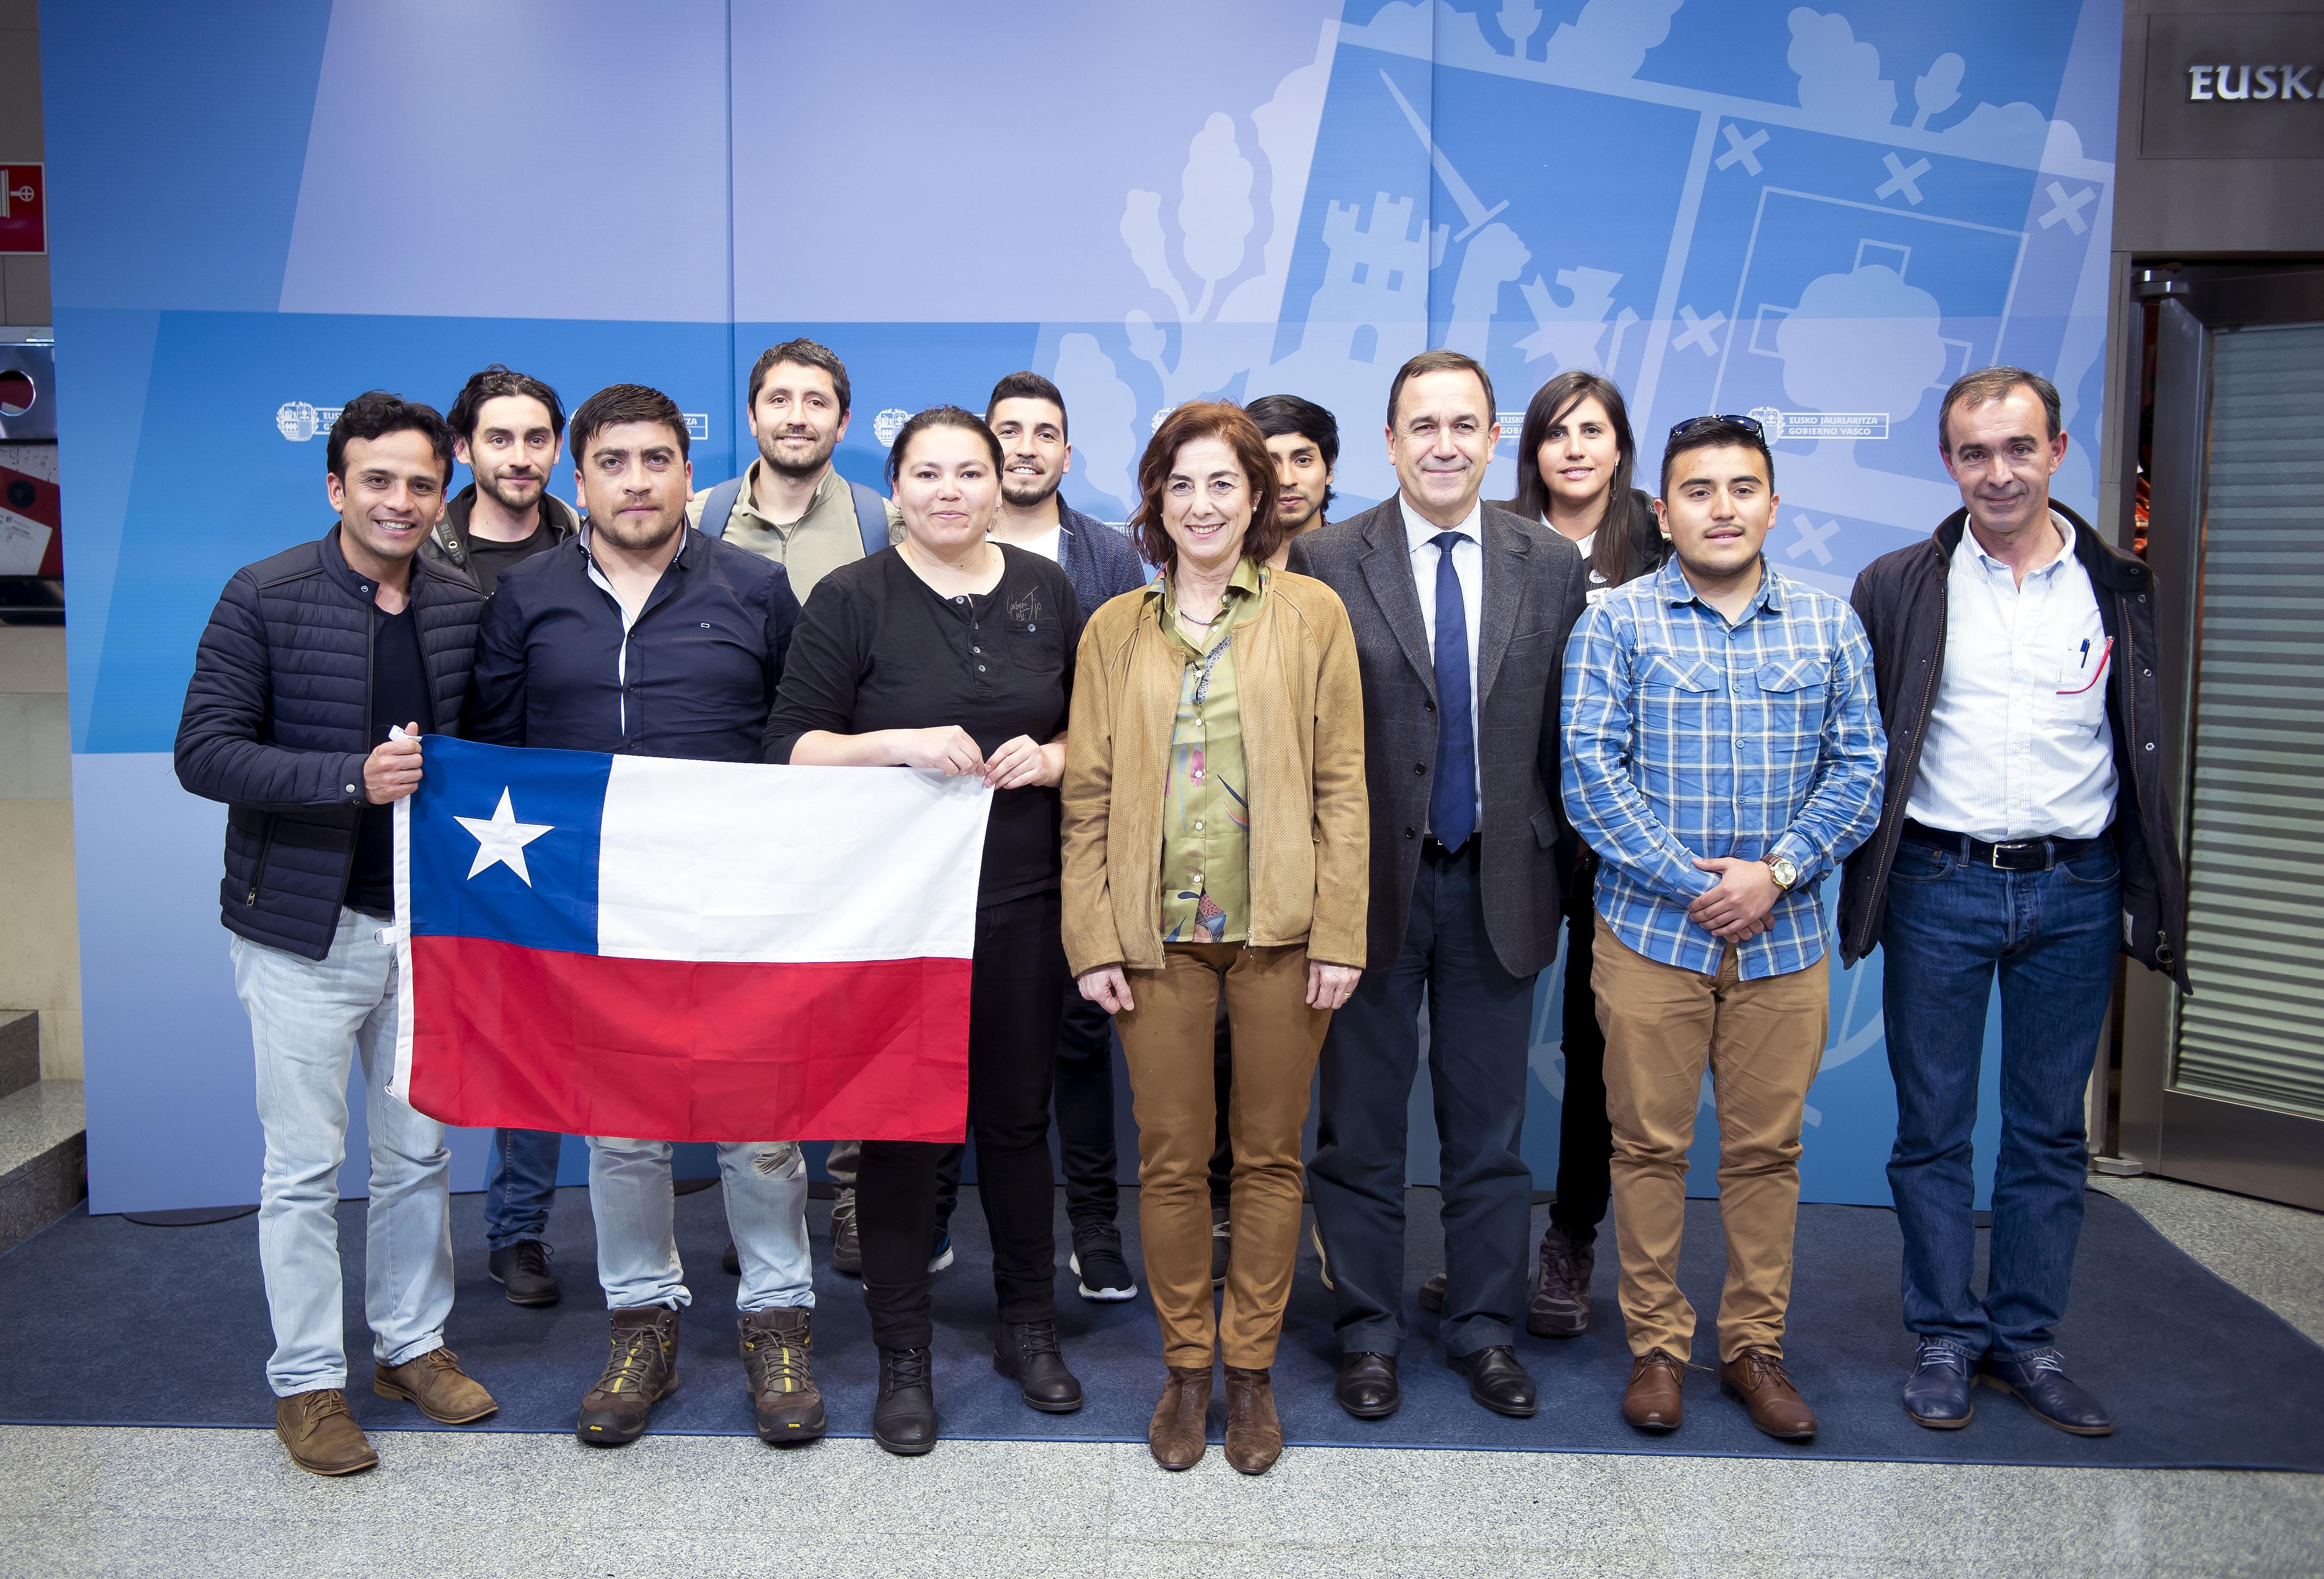 2017_02_20_uriarte_chilenos_fp_06.jpg